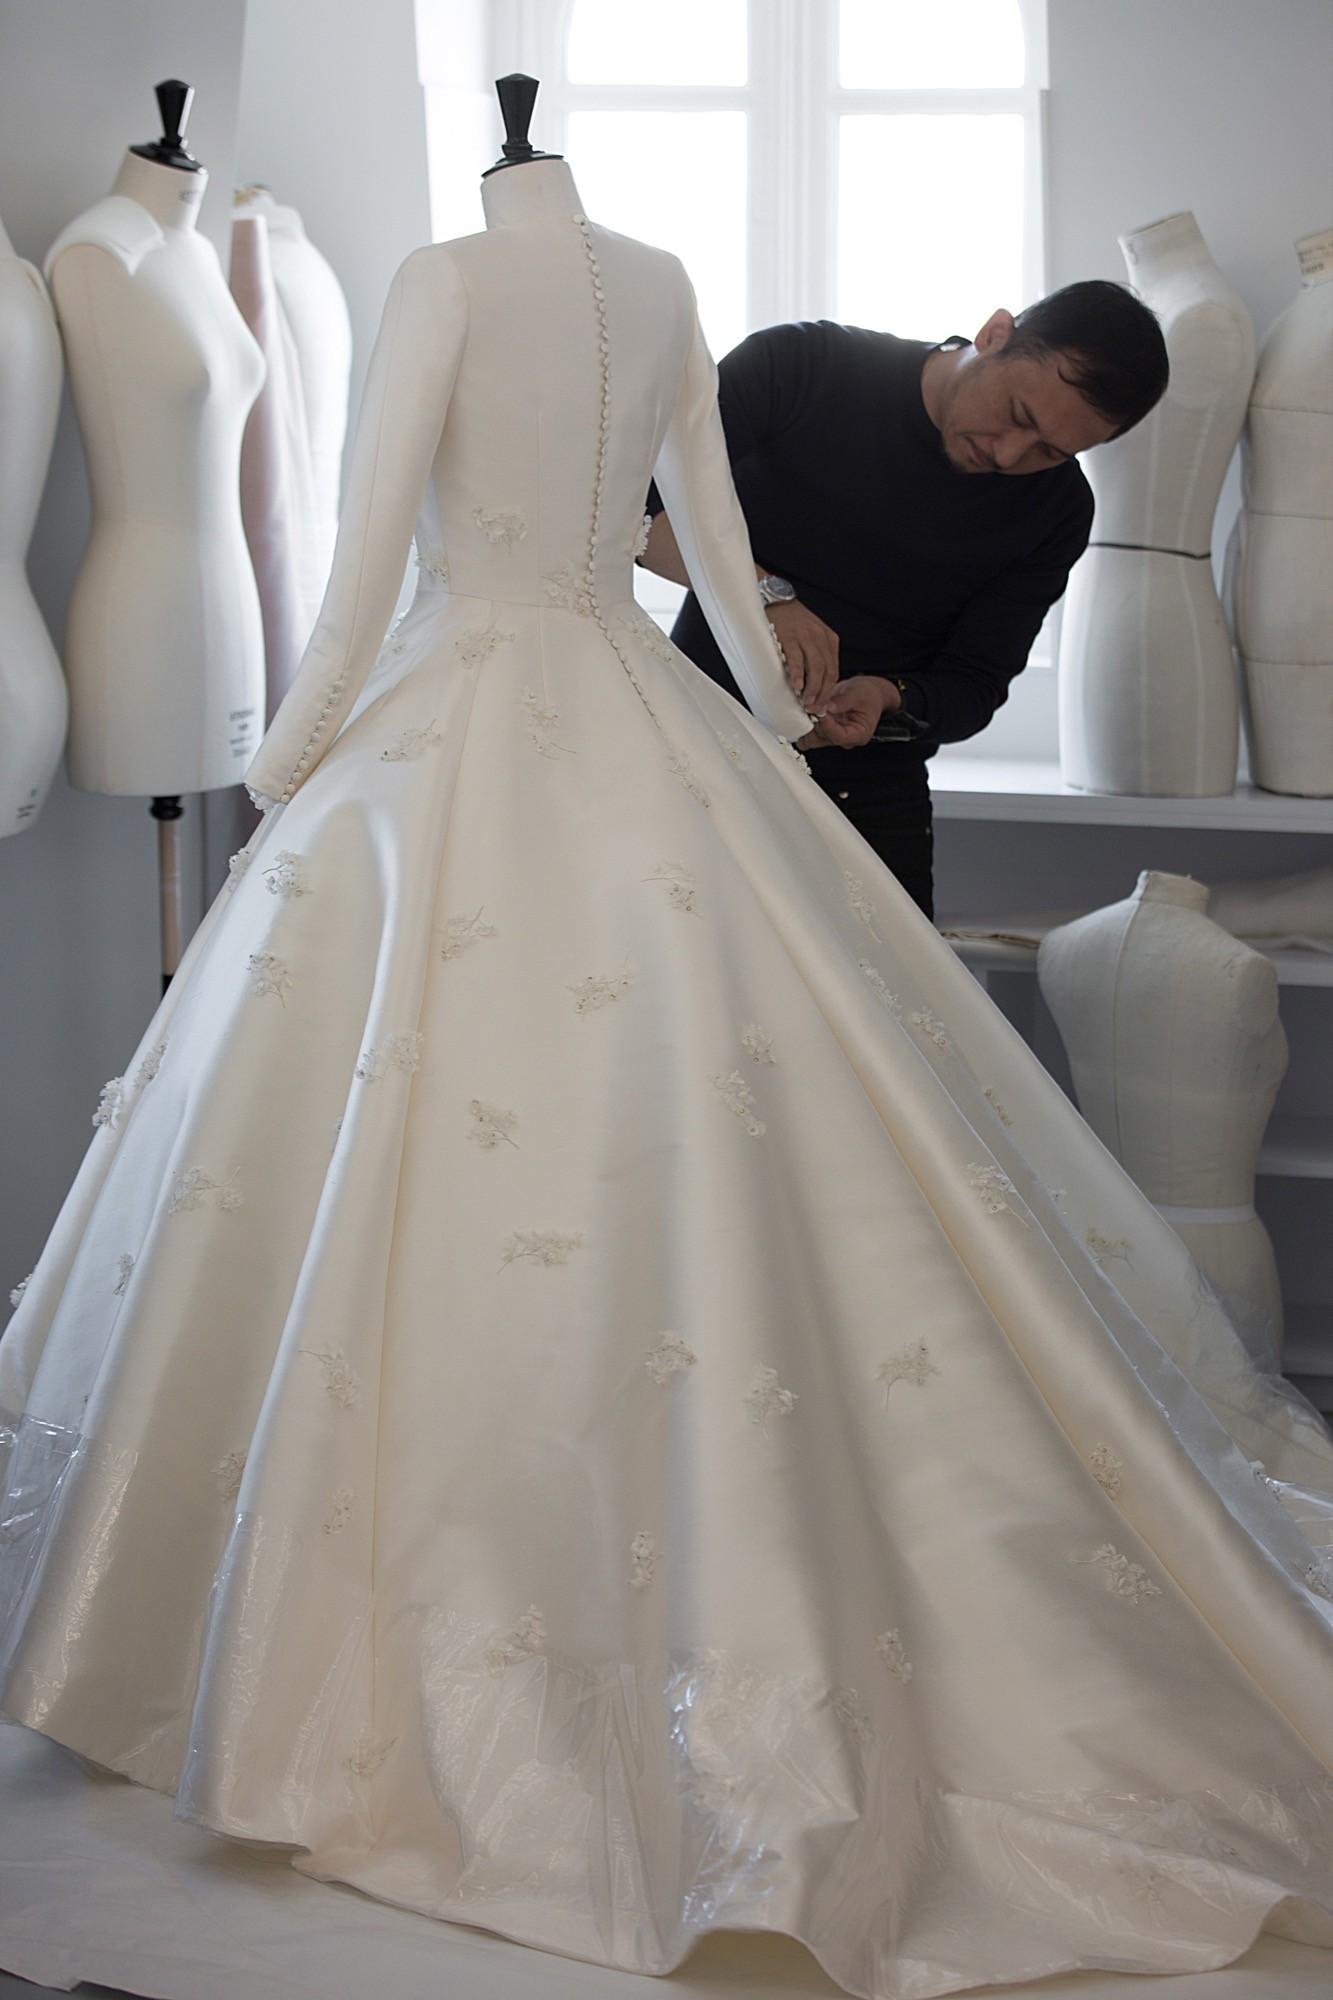 The Making of Miranda Kerr's Dior Wedding Gown - Savoir Flair